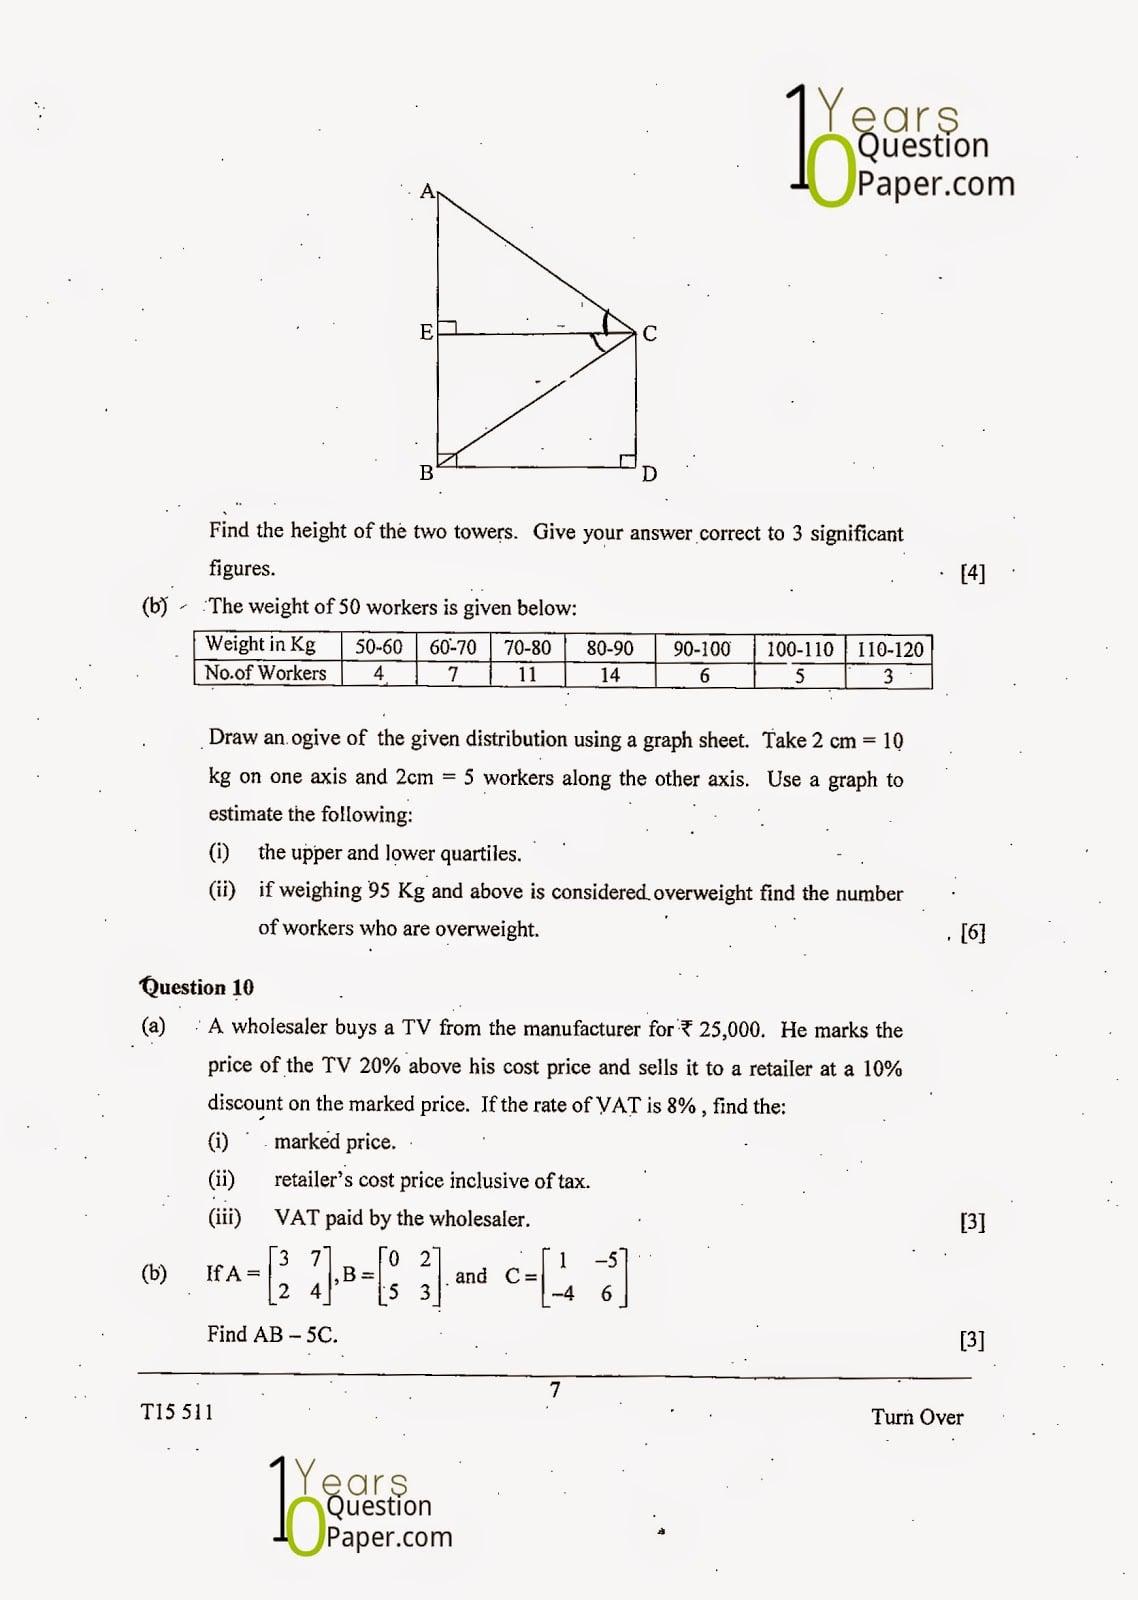 ICSE Class 10 Mathematics 2015 Question Paper